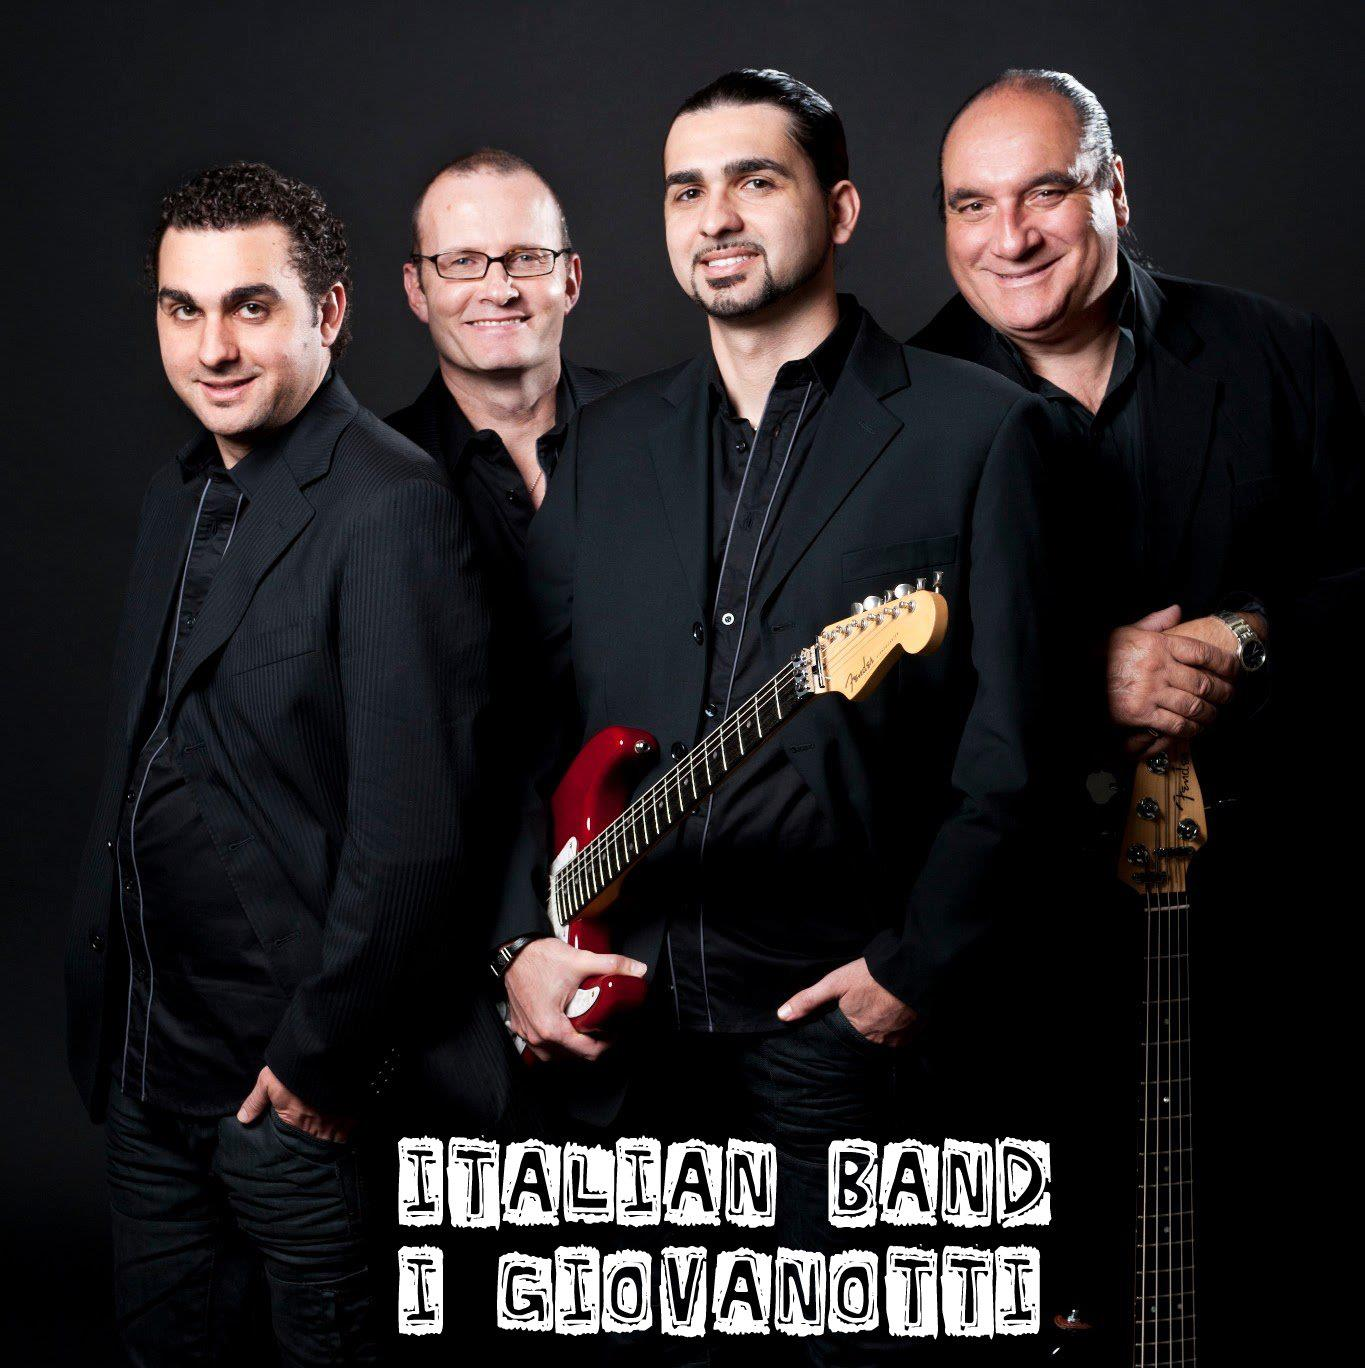 Italian Bands: Italian Band,and Italian Entertainment And Singers,wedding